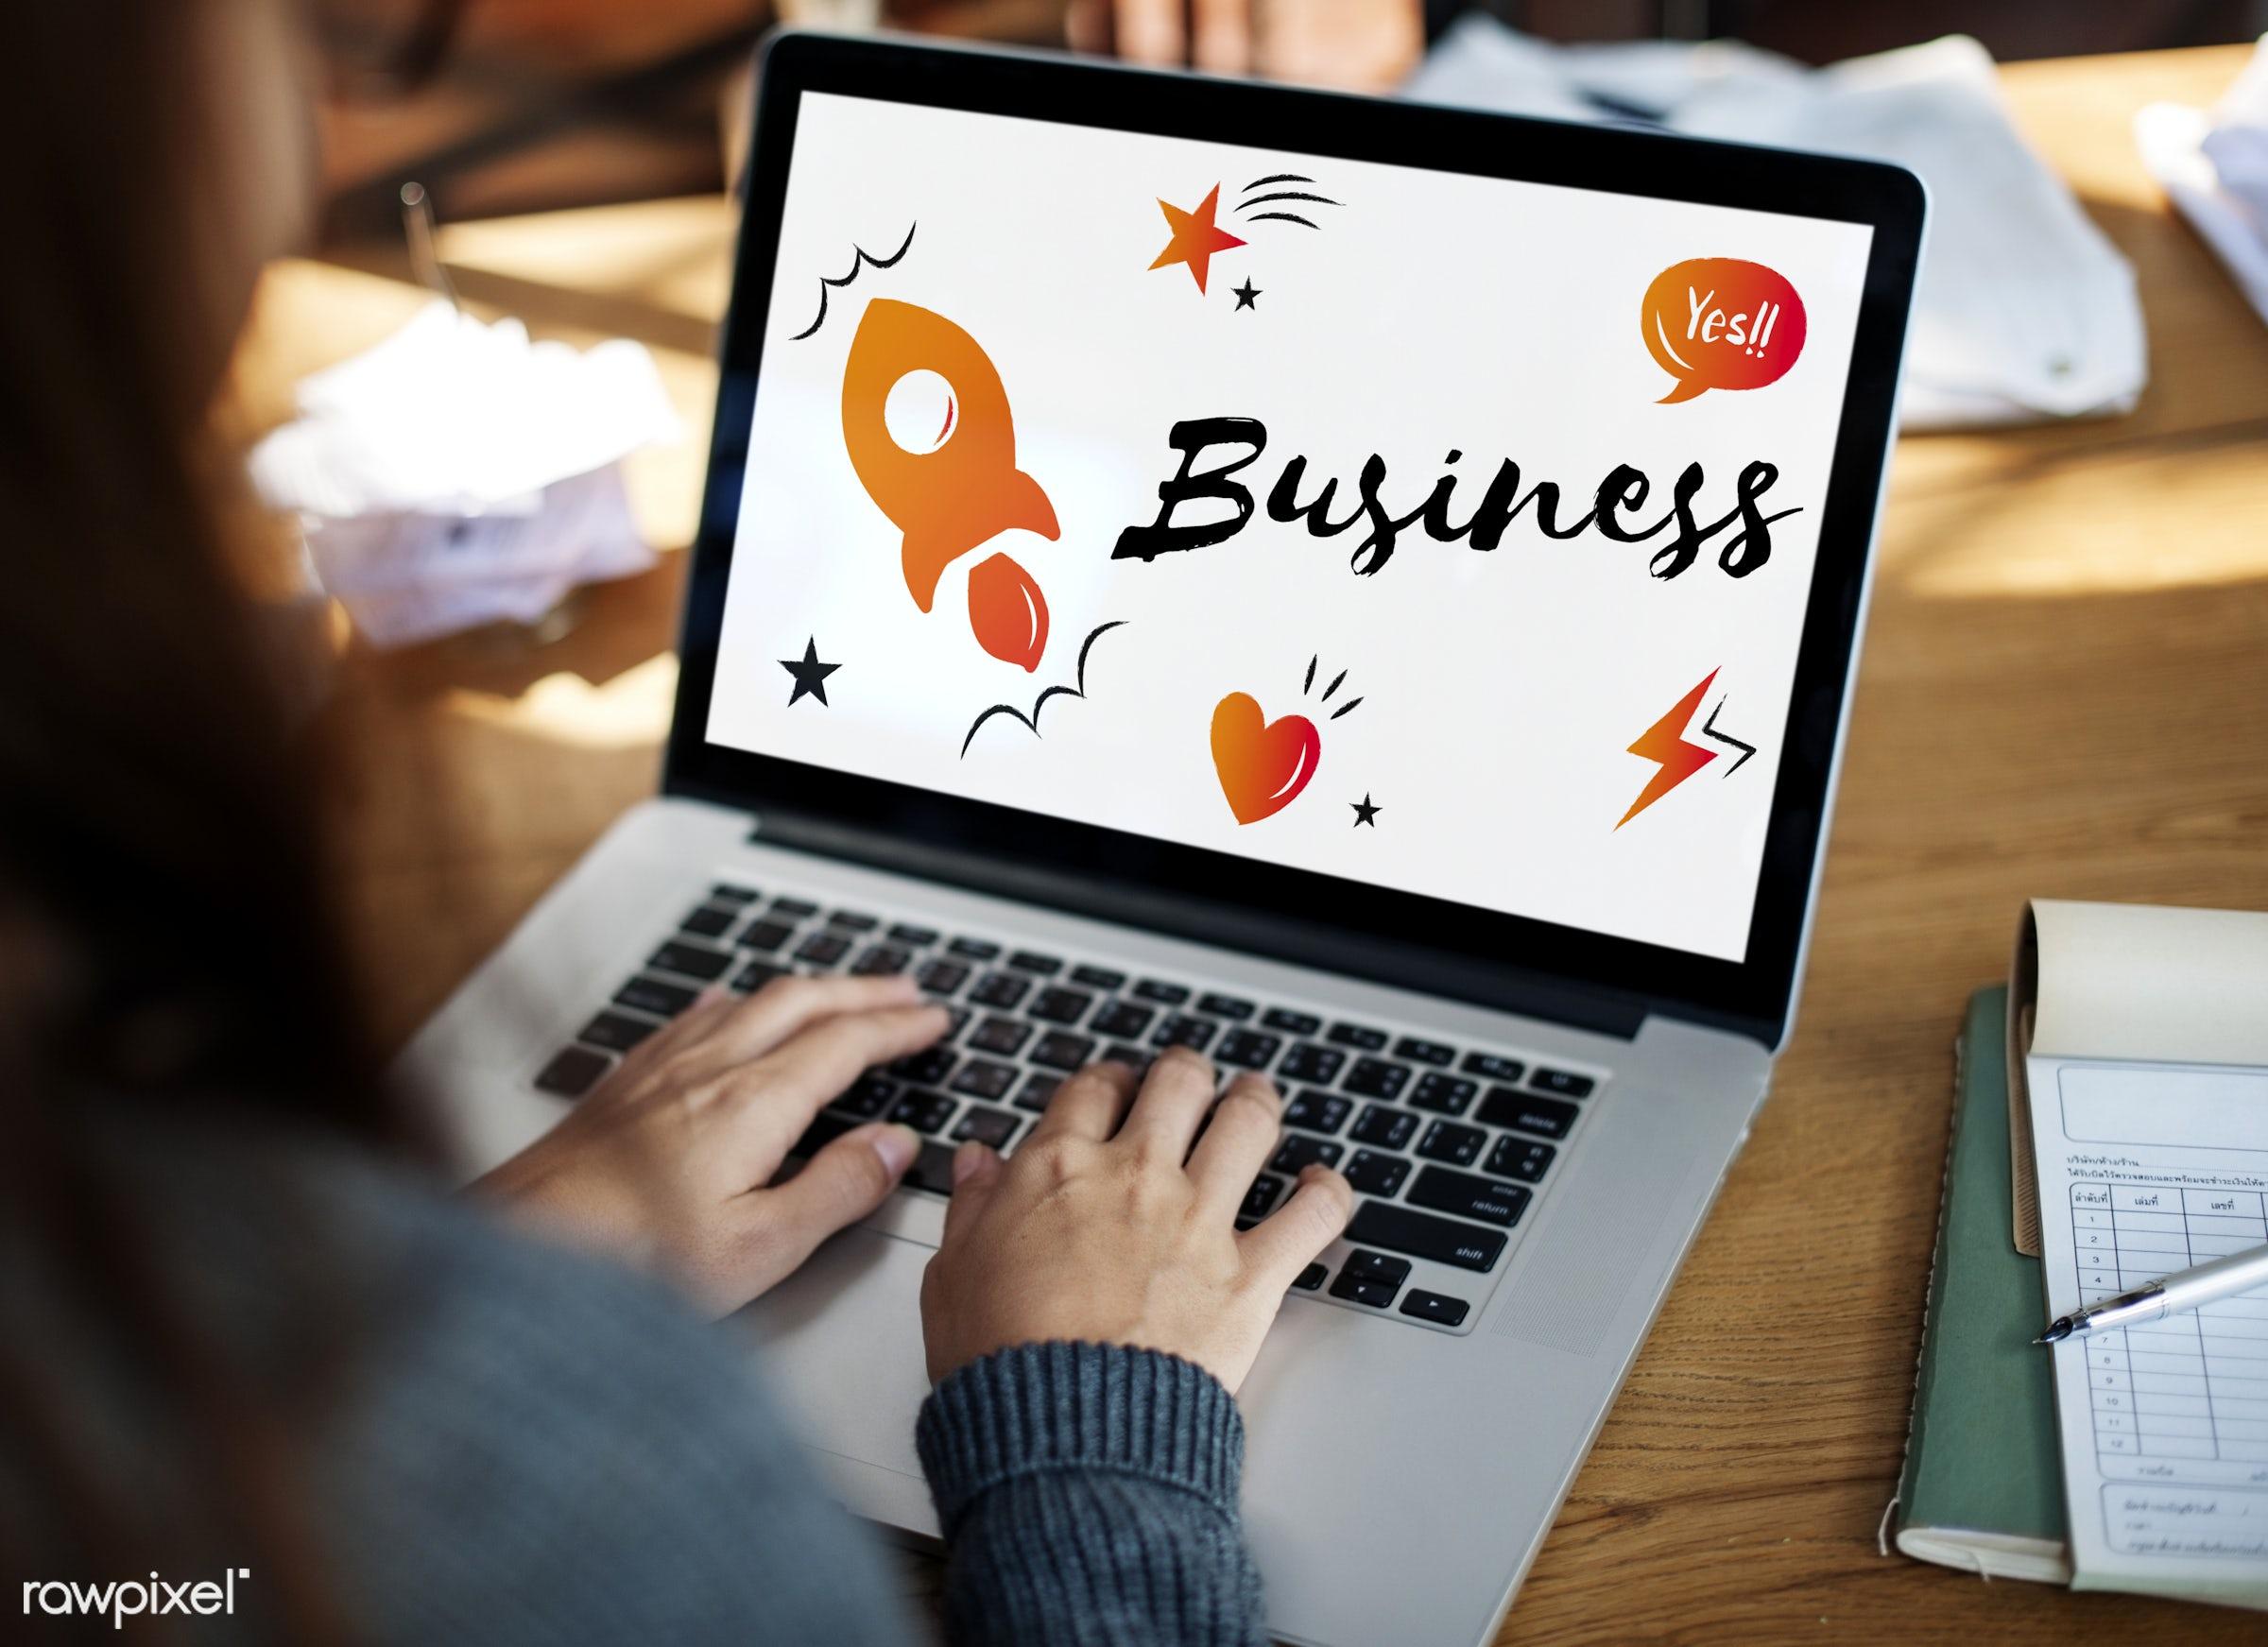 aspirations, browsing, business, business plan, creative, development, device, digital, digital device, enterprise, hands,...